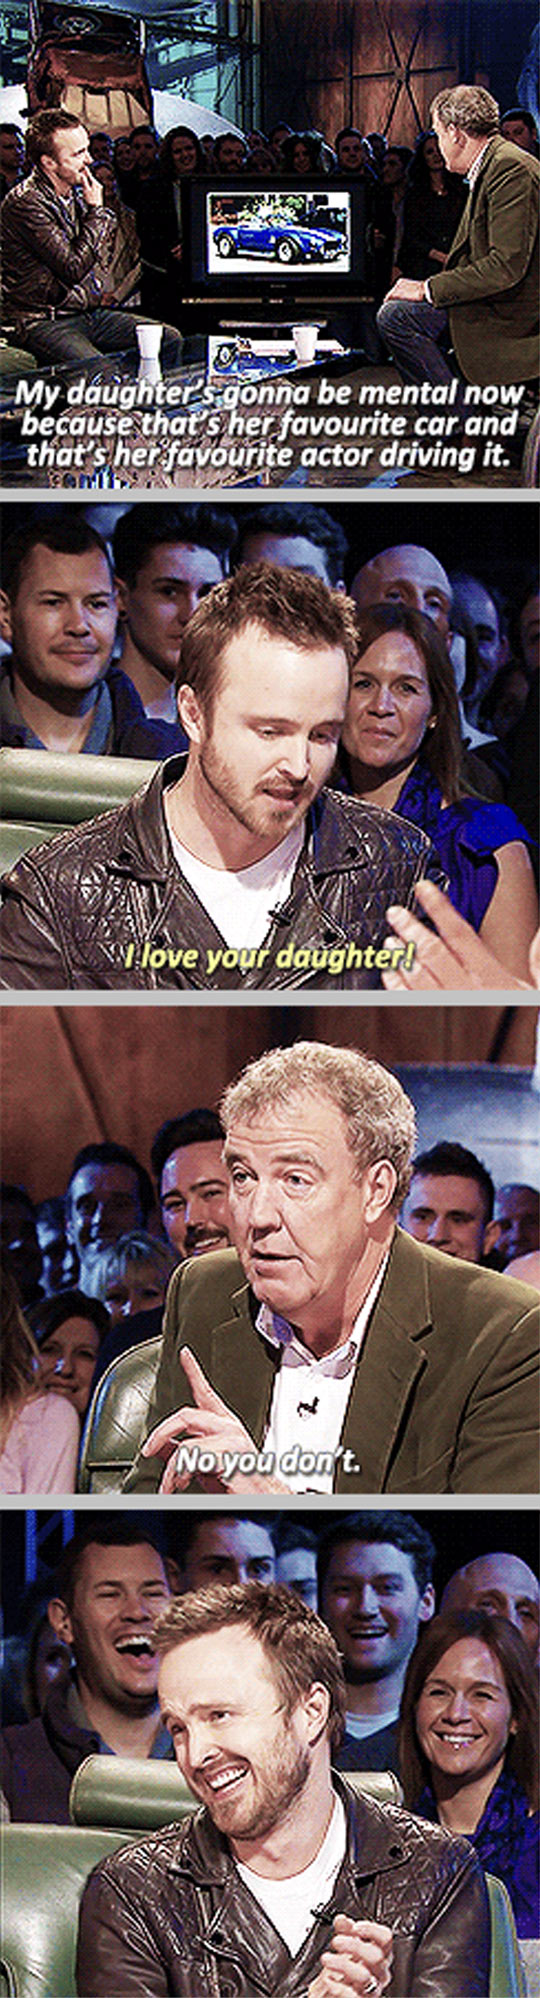 funny-Aaron-Paul-Top-Gear-car-daughter